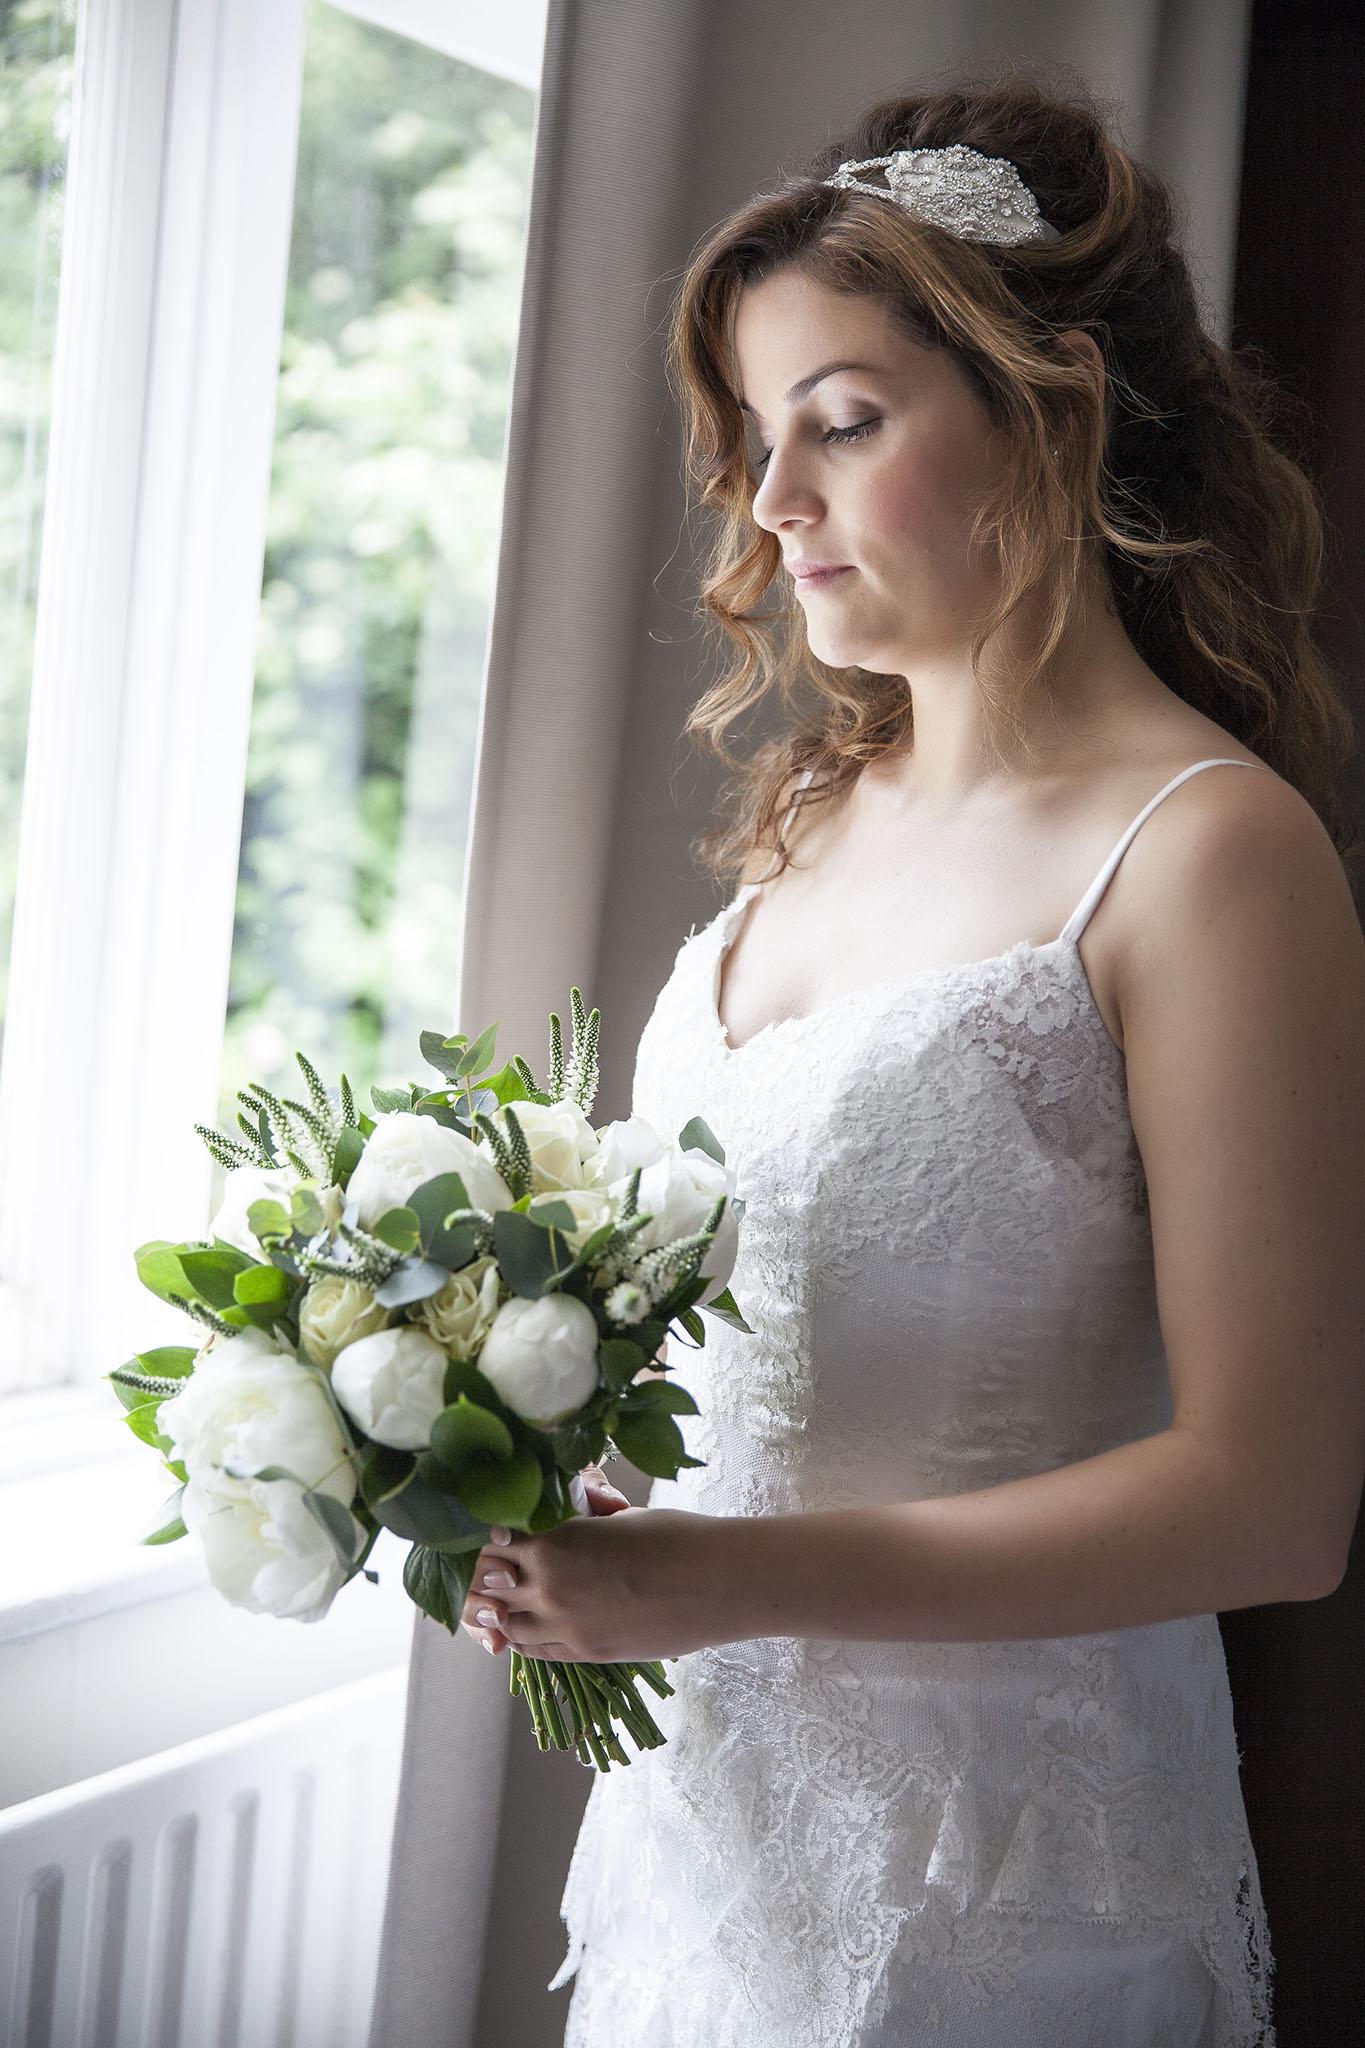 elizabethgphotography_kingslangley_hertfordshire_fineart_wedding_enfield_ricky_nicole_nahlis_11.jpg